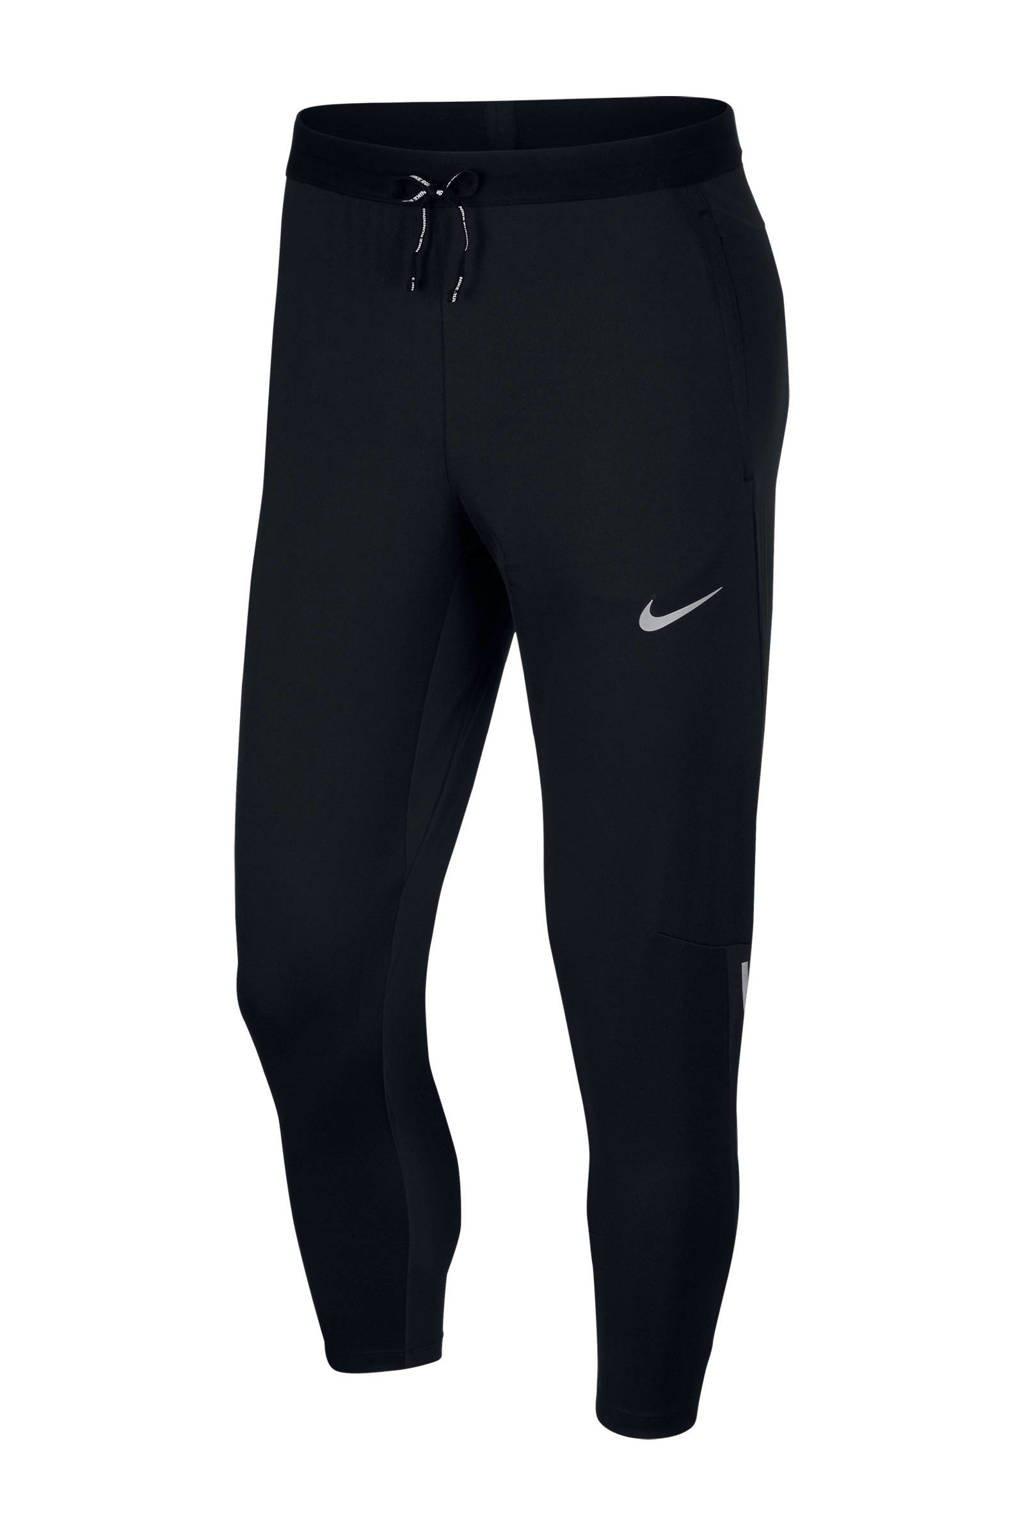 Nike   Shield Phenom hardloopbroek zwart, Zwart